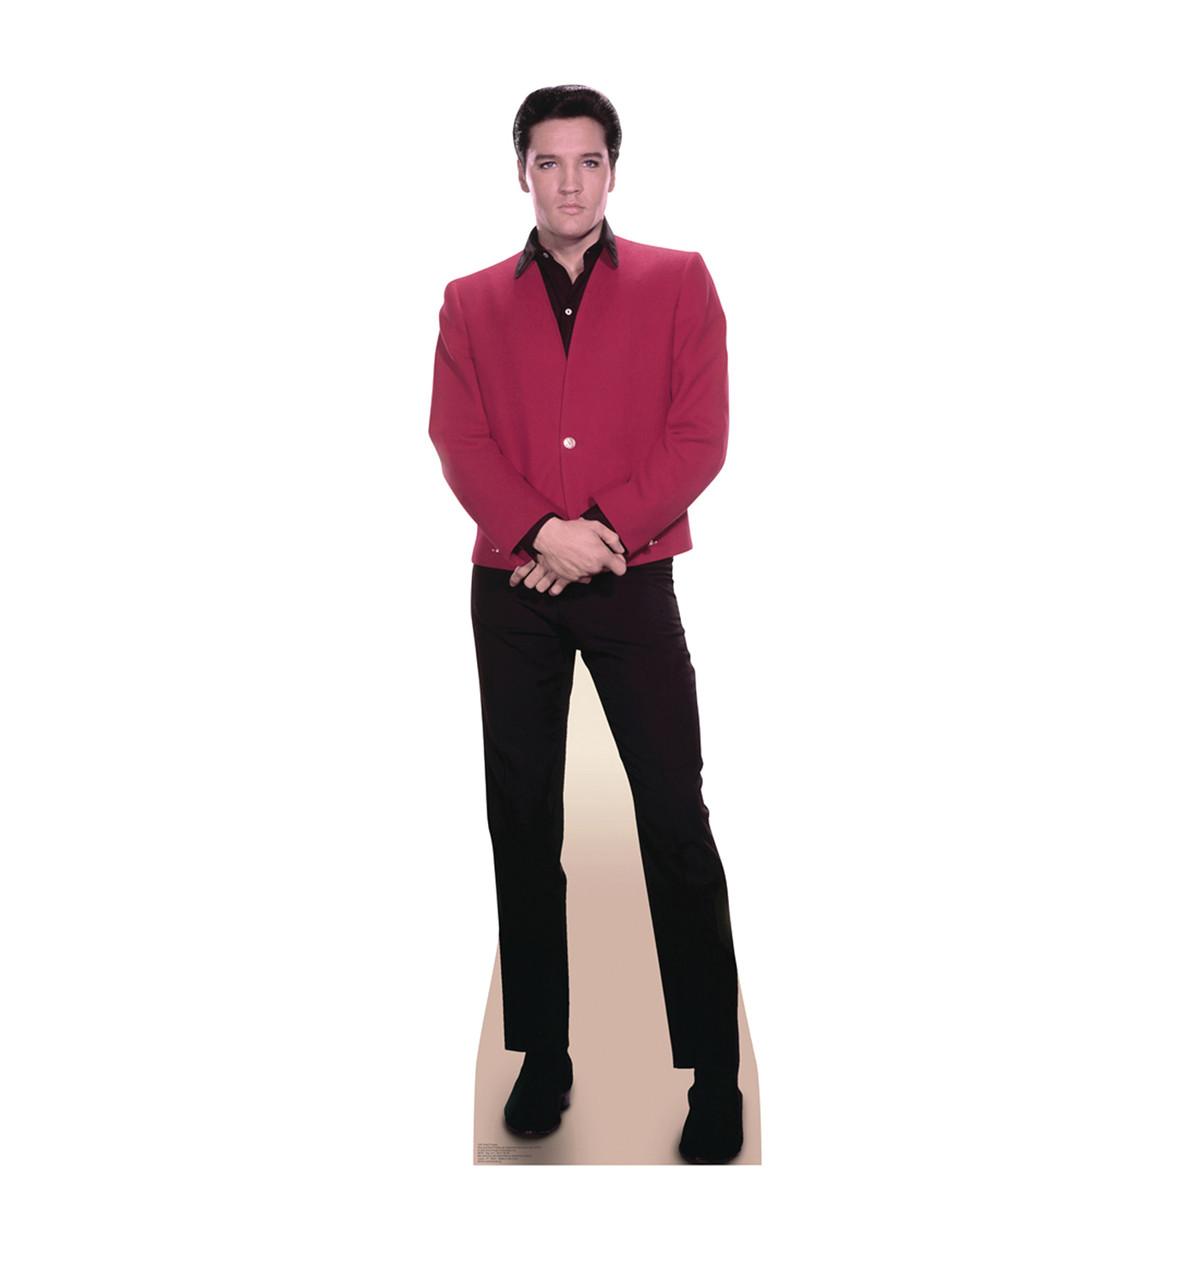 Elvis Red Jacket-Cardboard Cutout 1351